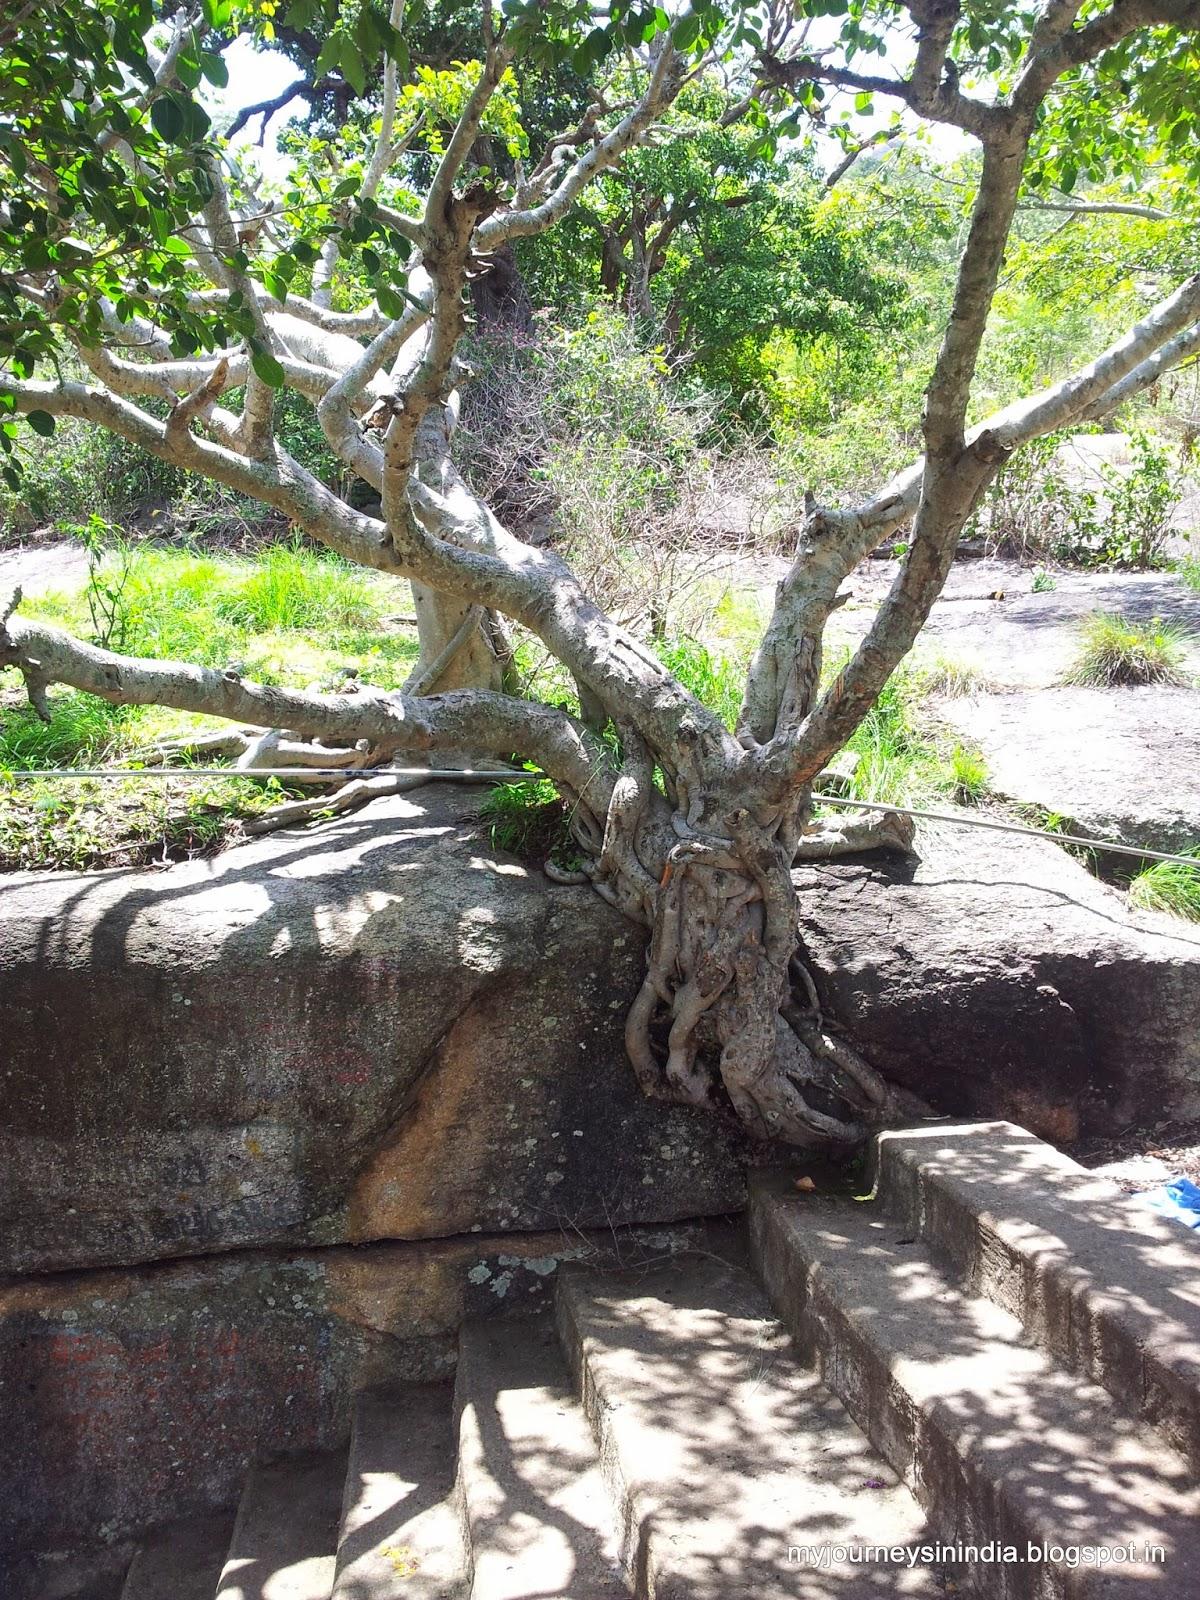 Trees growing on rocks - Siddara Betta